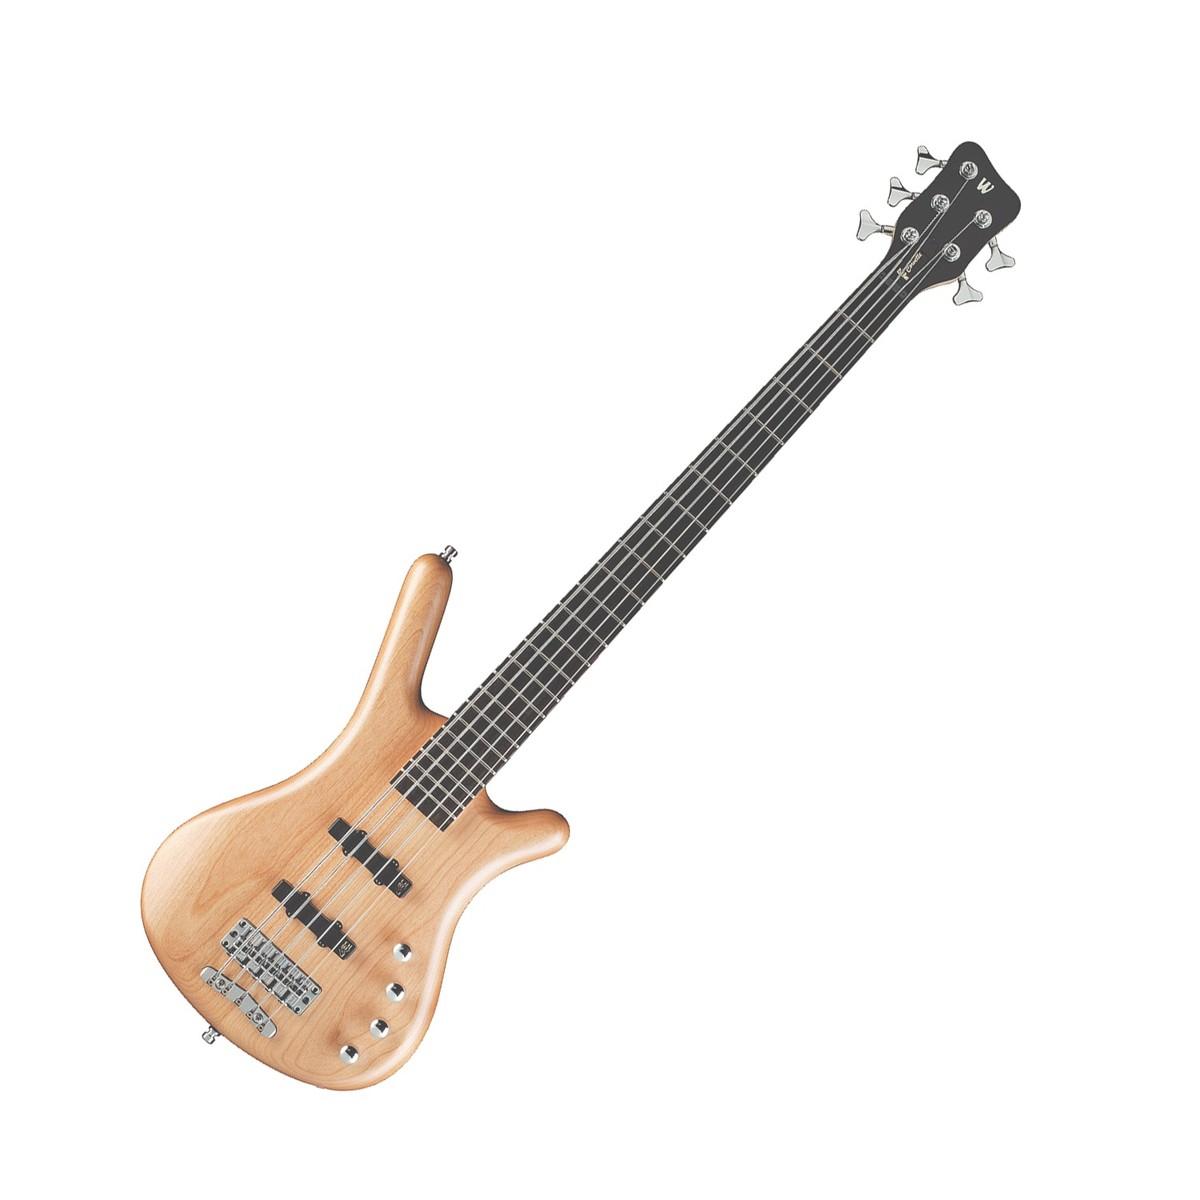 Warwick 5 String Bass : warwick rockbass corvette basic 5 string bass natural satin at ~ Vivirlamusica.com Haus und Dekorationen